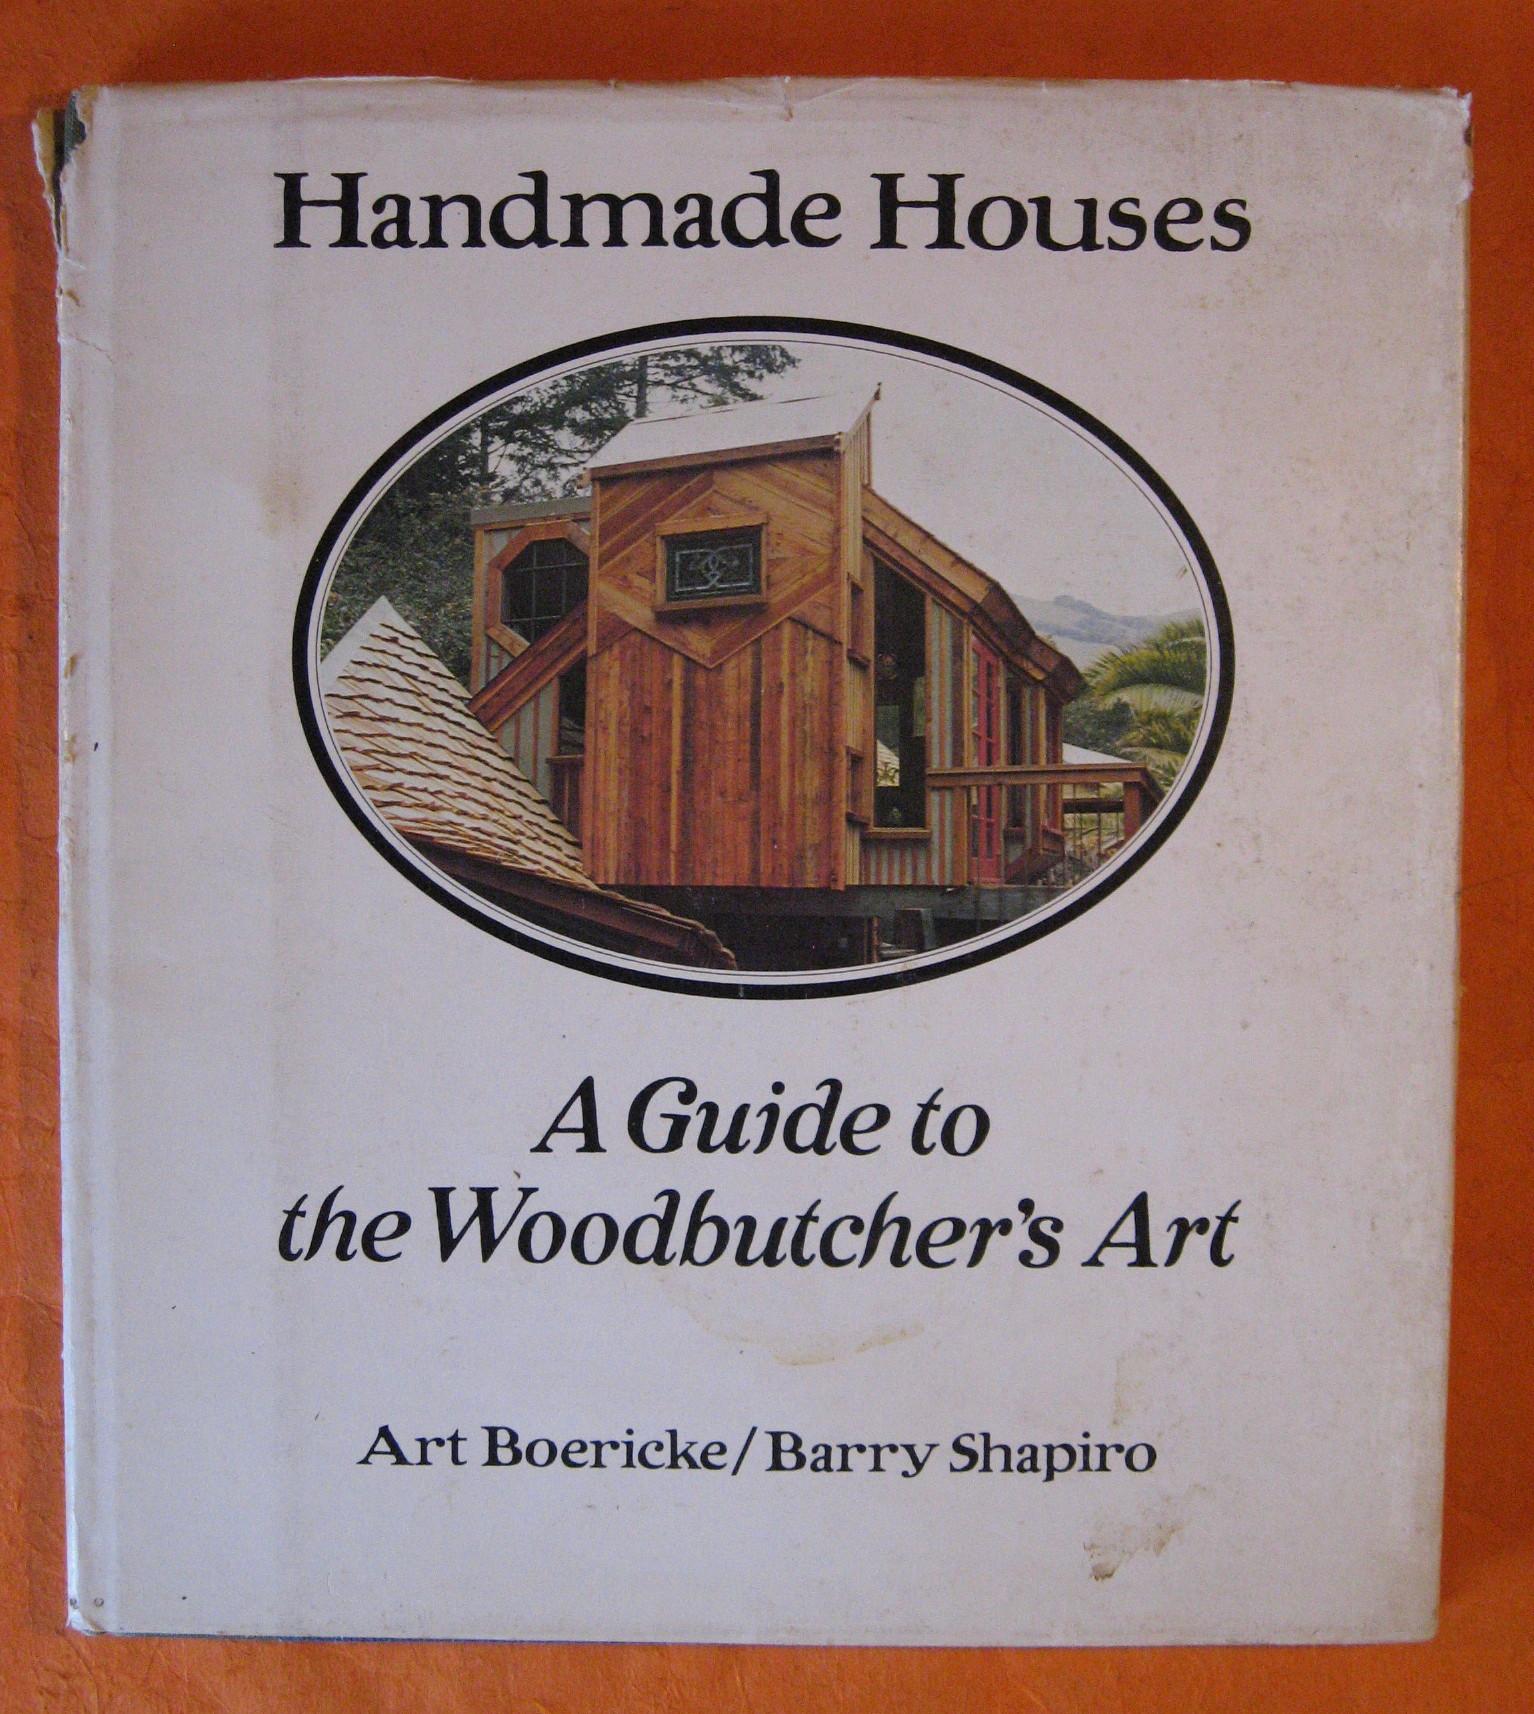 Handmade Houses: A Guide to the Woodbutcher's Art, Art Boericke; Barry Shapiro